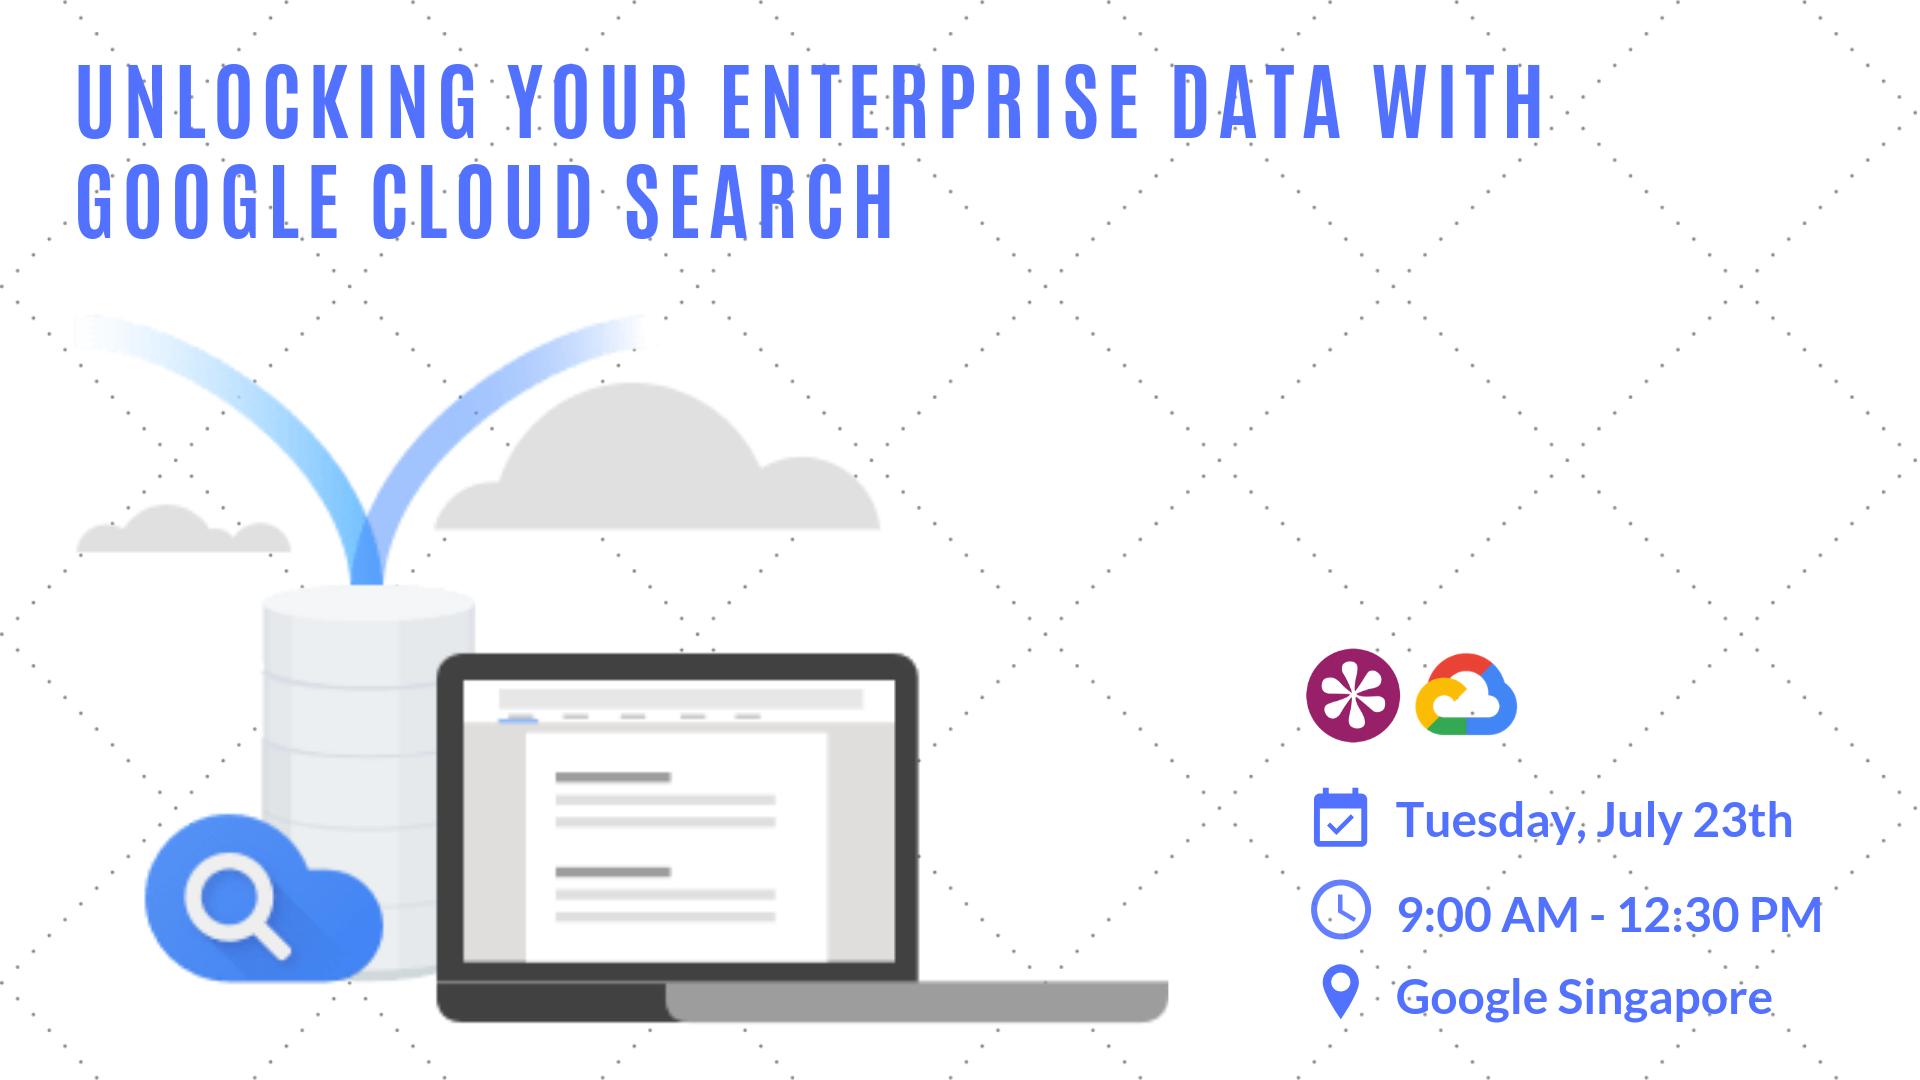 S23-07-19 Unlocking your enterprise data with Google Cloud Search - thumbnail